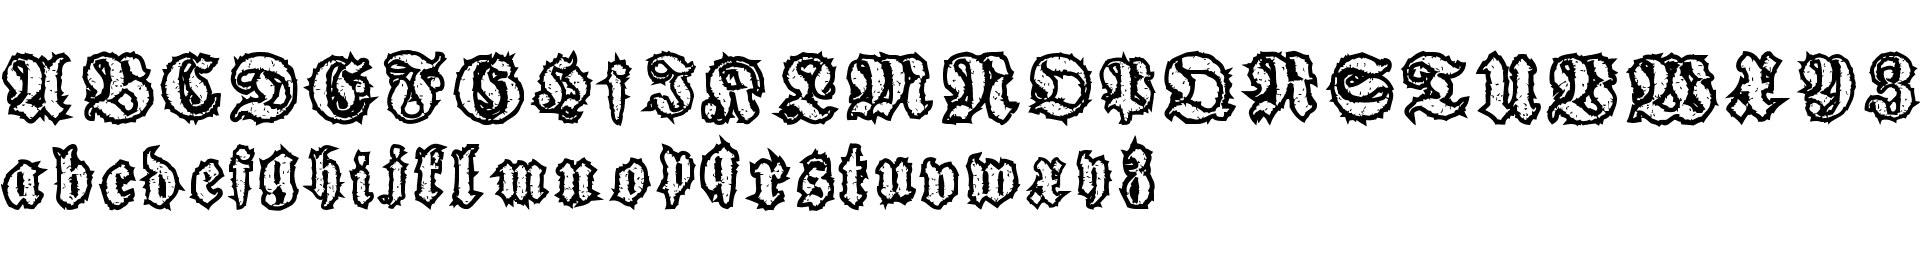 woodcutter gothic drama